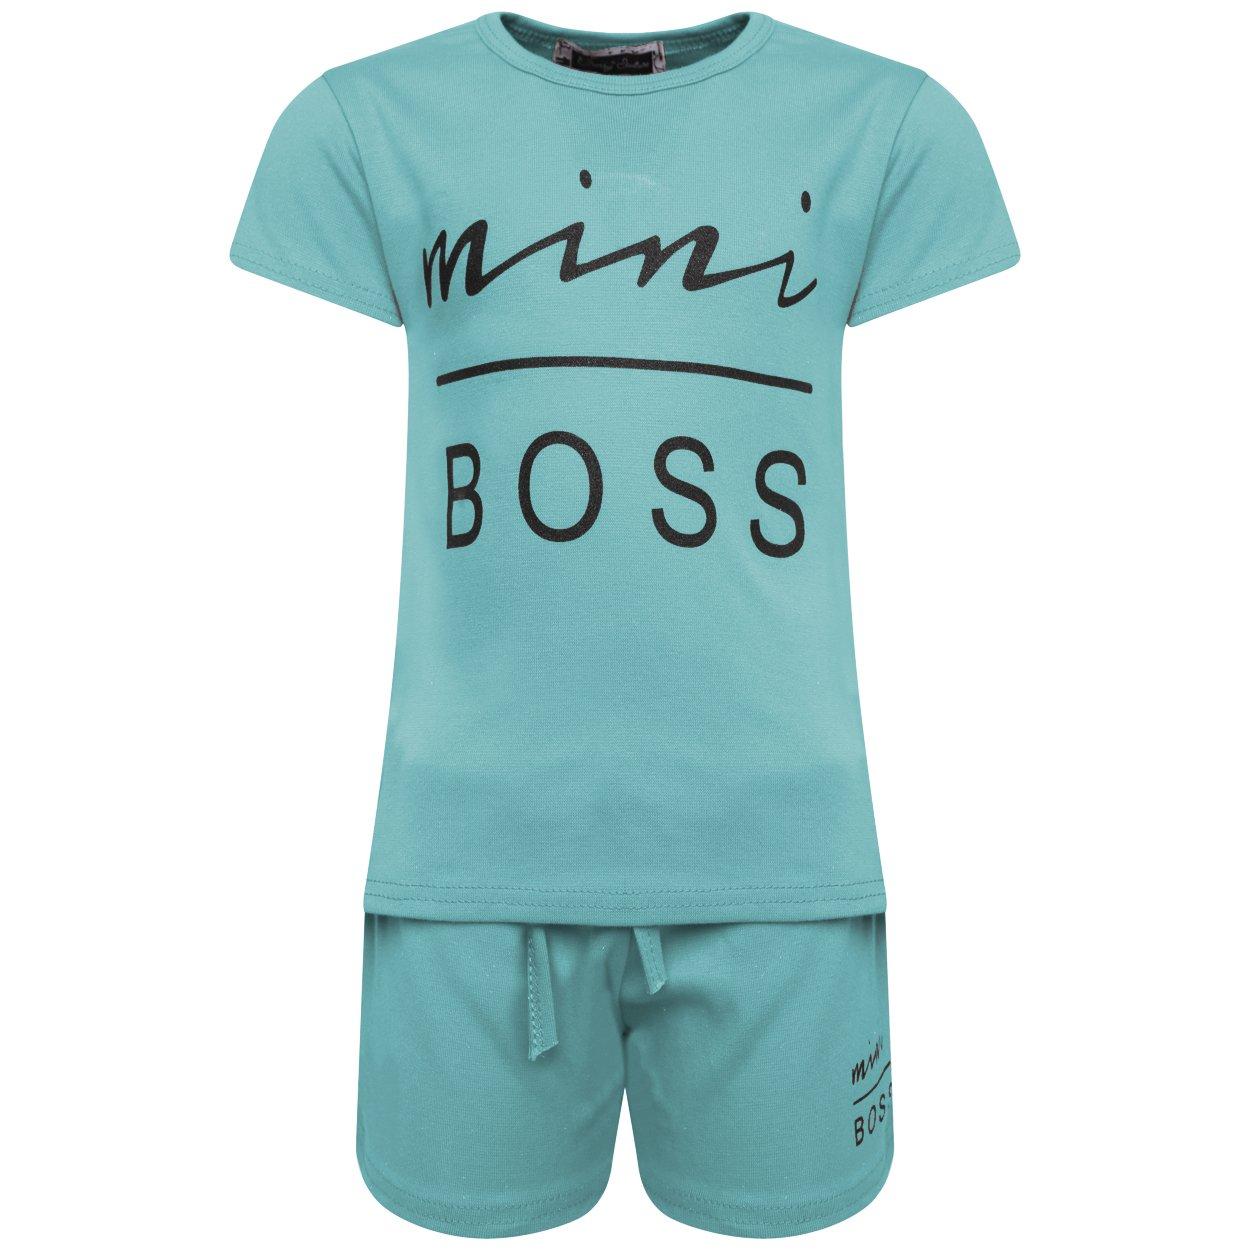 Girls Children\'s Mini Boss Loungewear Printed Slogan Kids Two Piece Two and Shorts Set 2-13